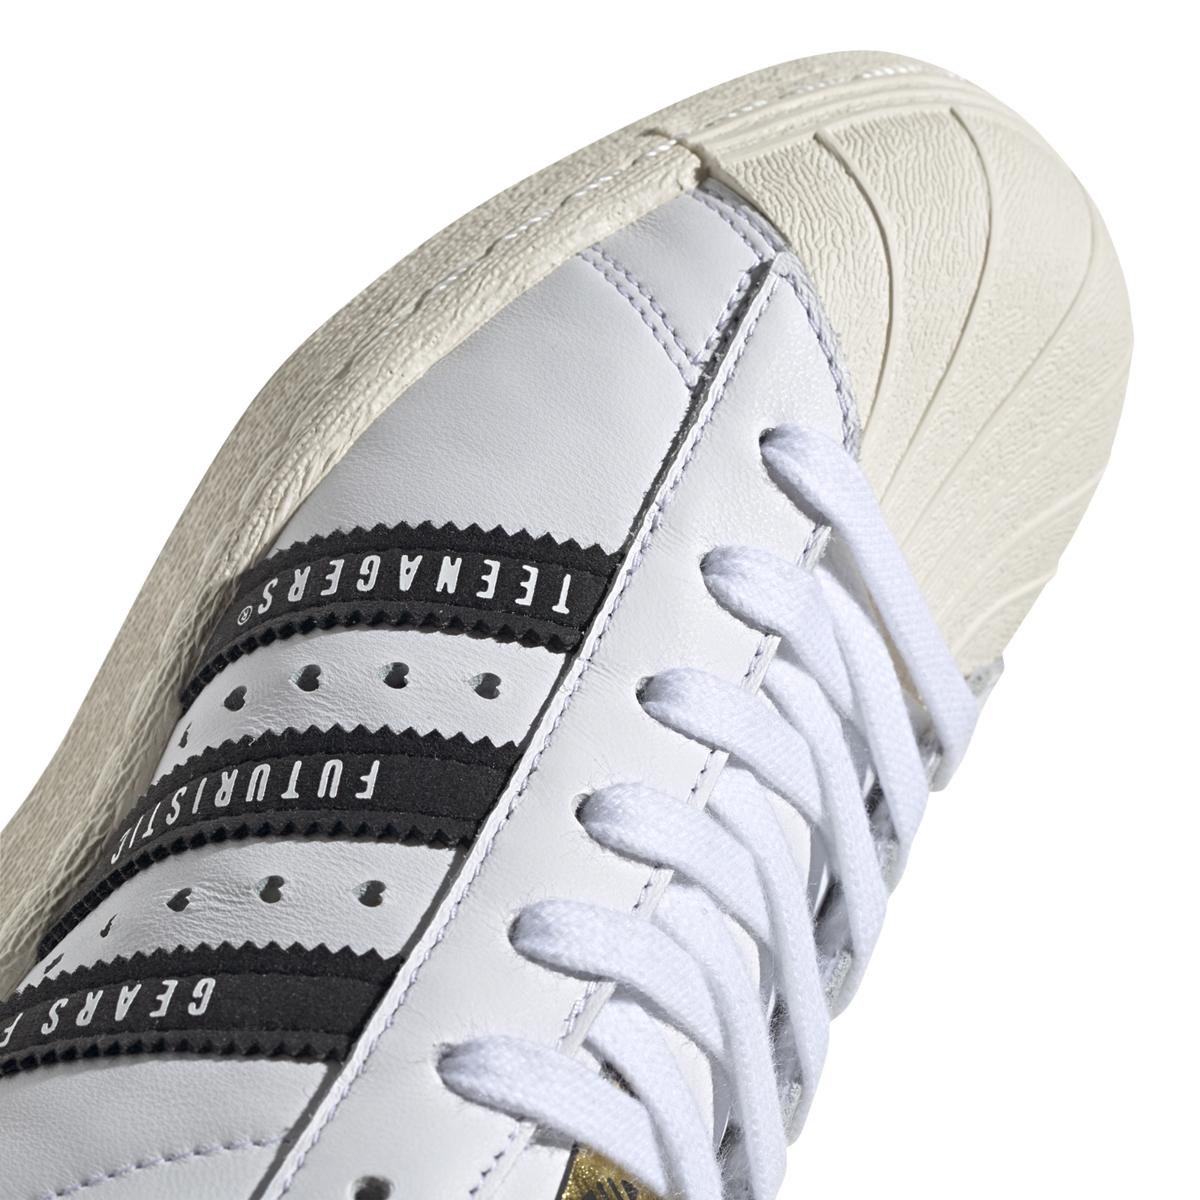 adidas Human Made Superstar 80s